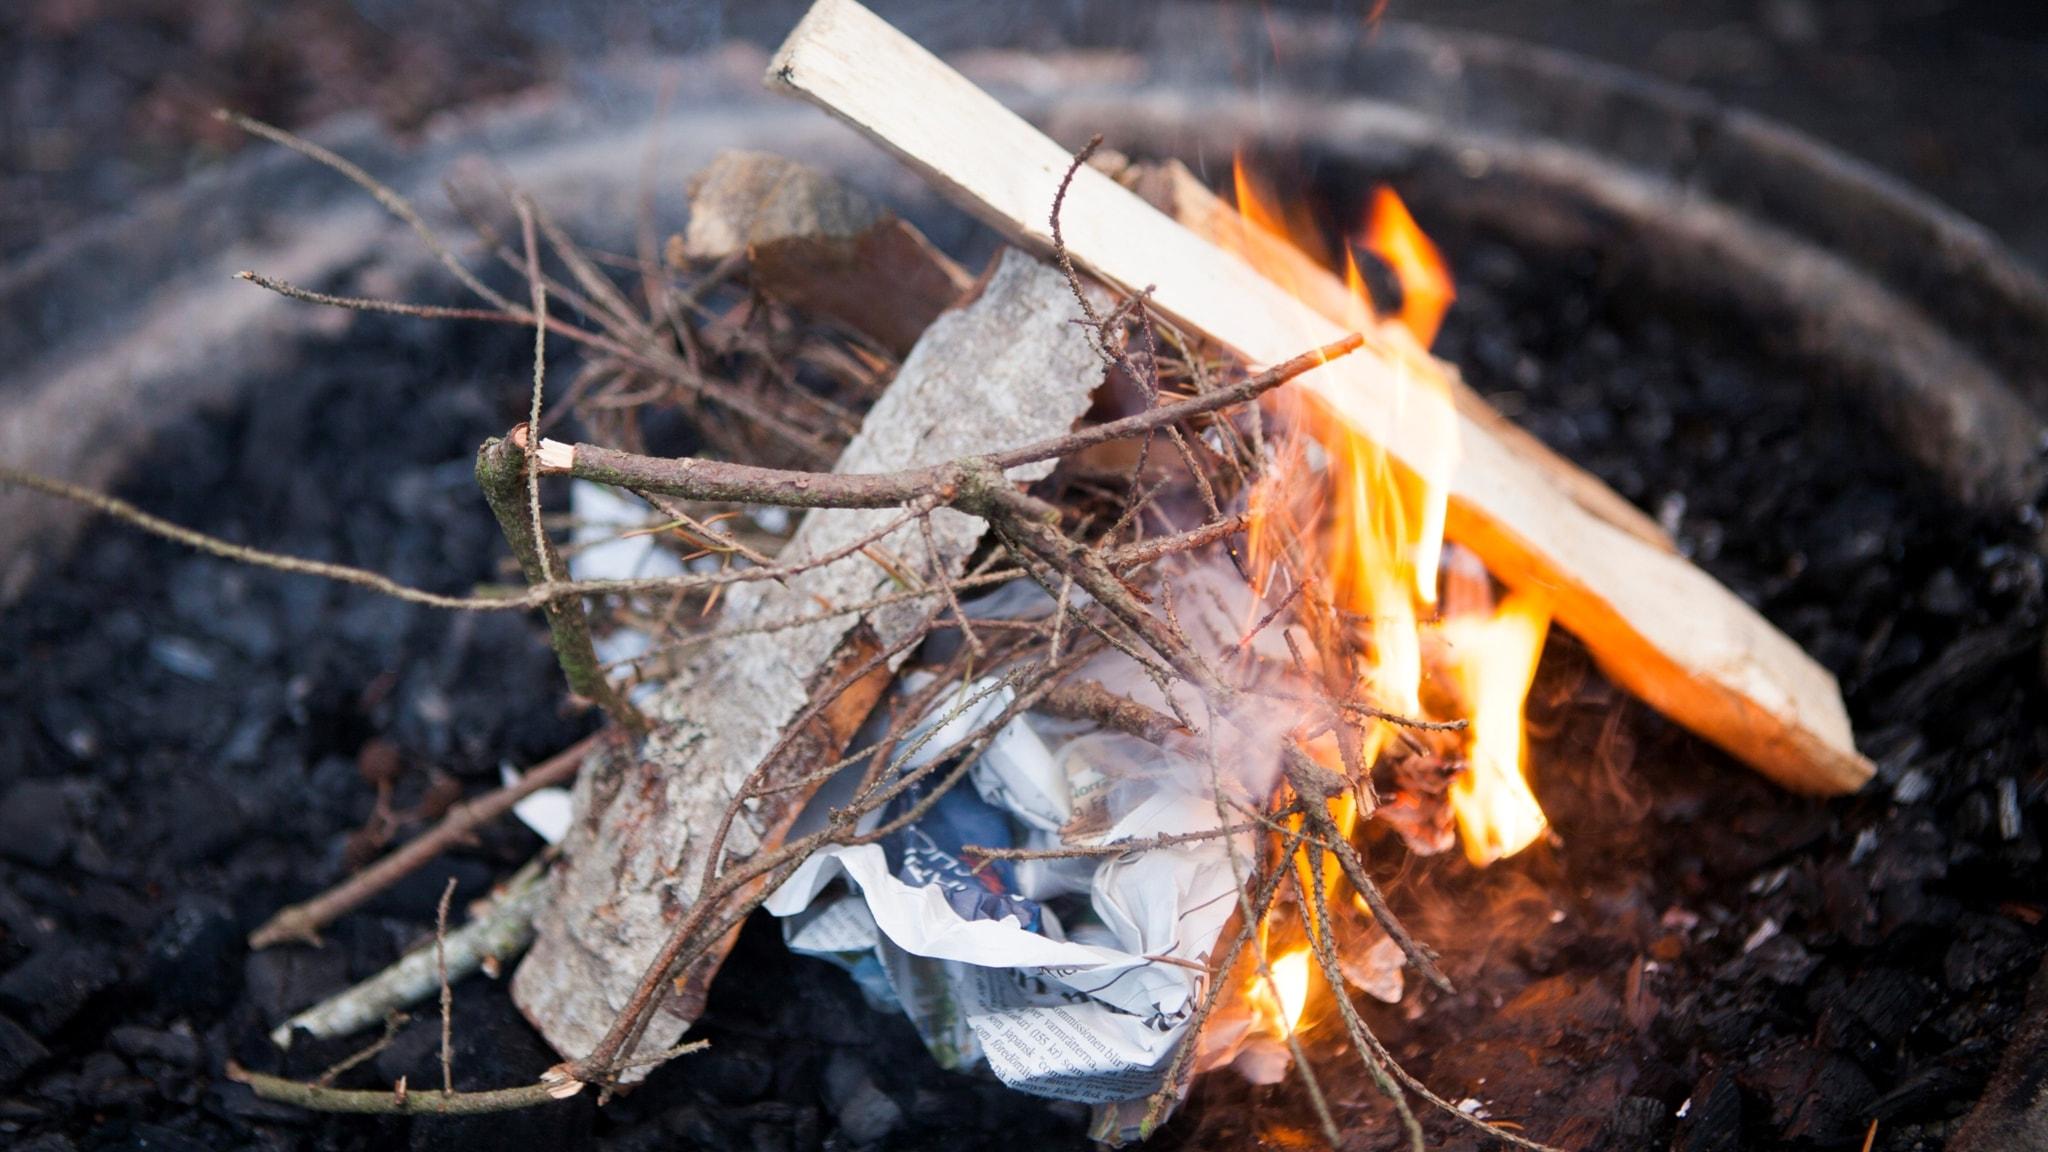 Begging permits in Eskilstuna, tunnel speed cameras and wood smoke dangers